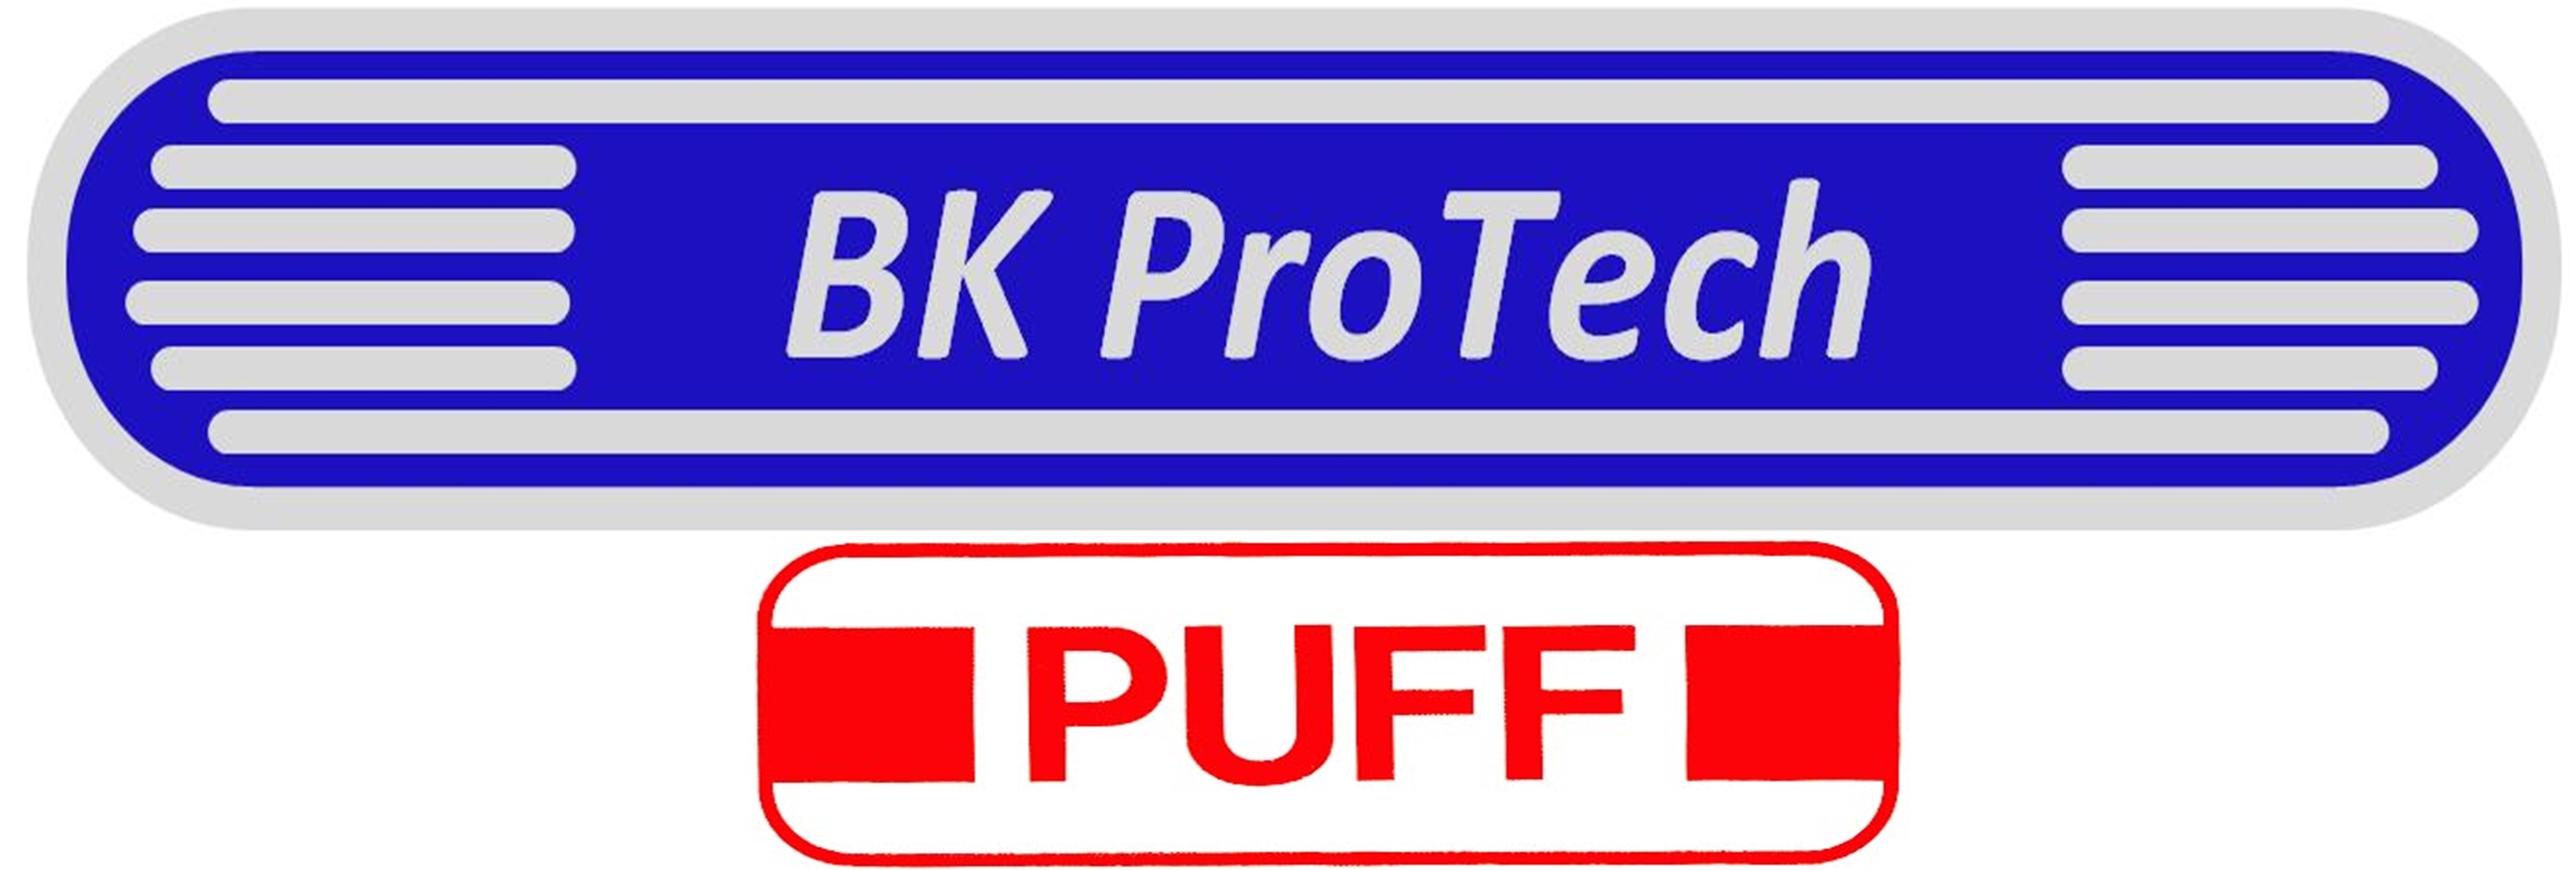 BKProtech